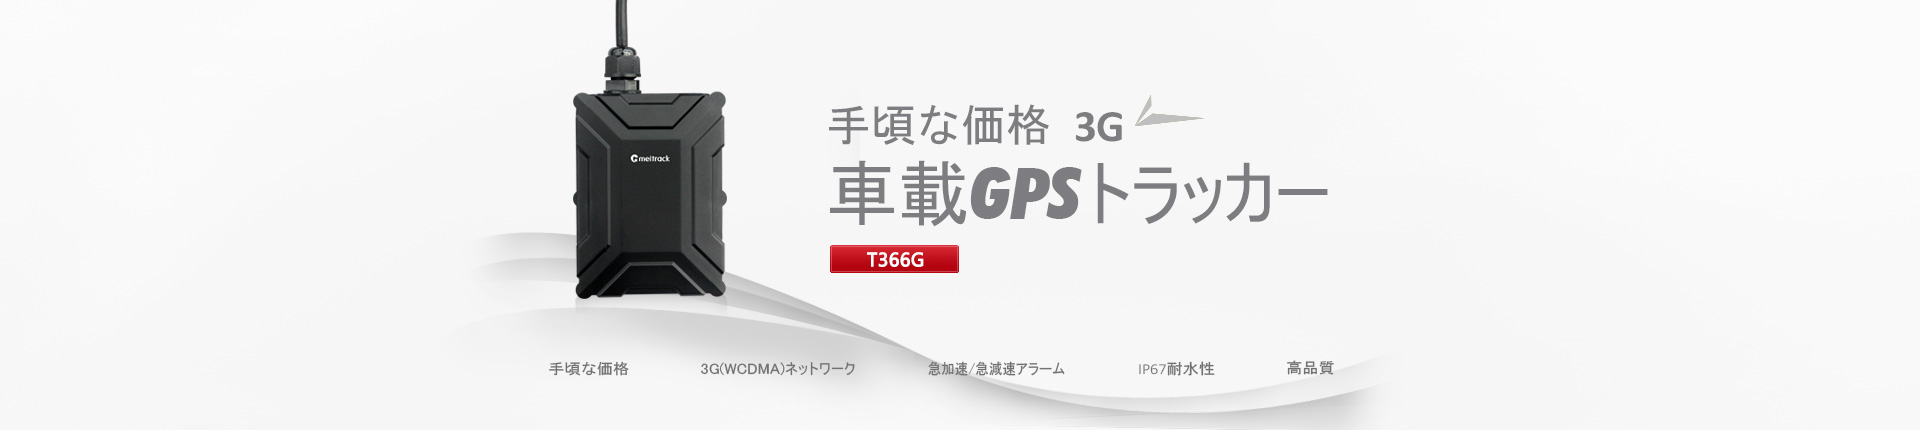 T366G-jp